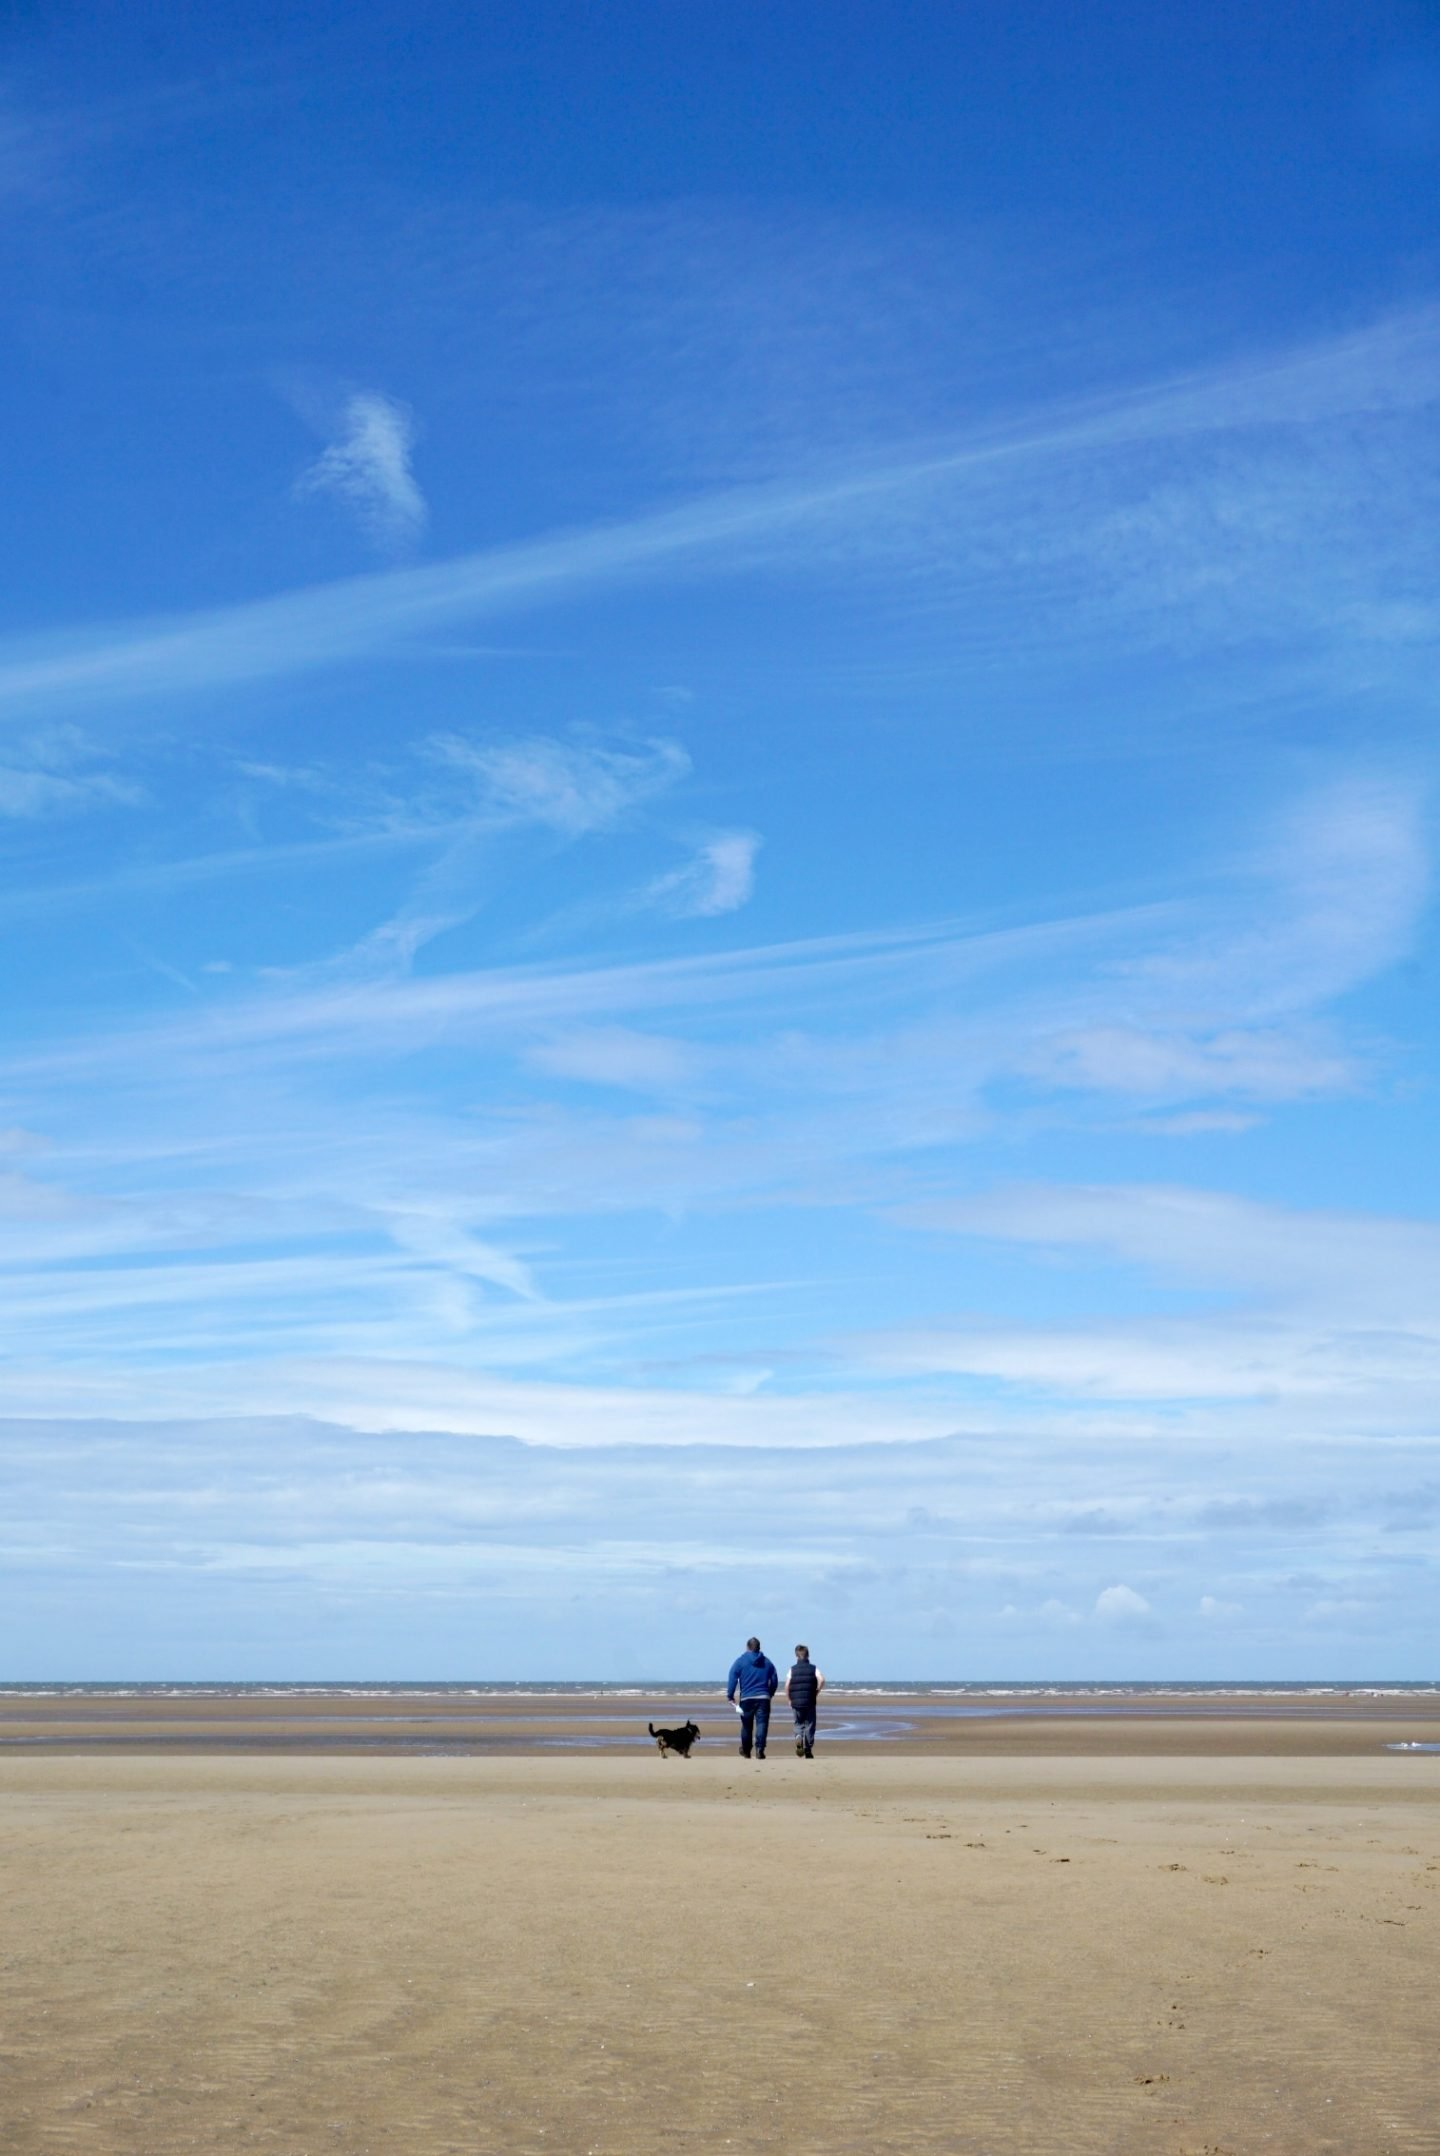 A Sunday walk on the beach At St Annes www.extraordinarychaos.com